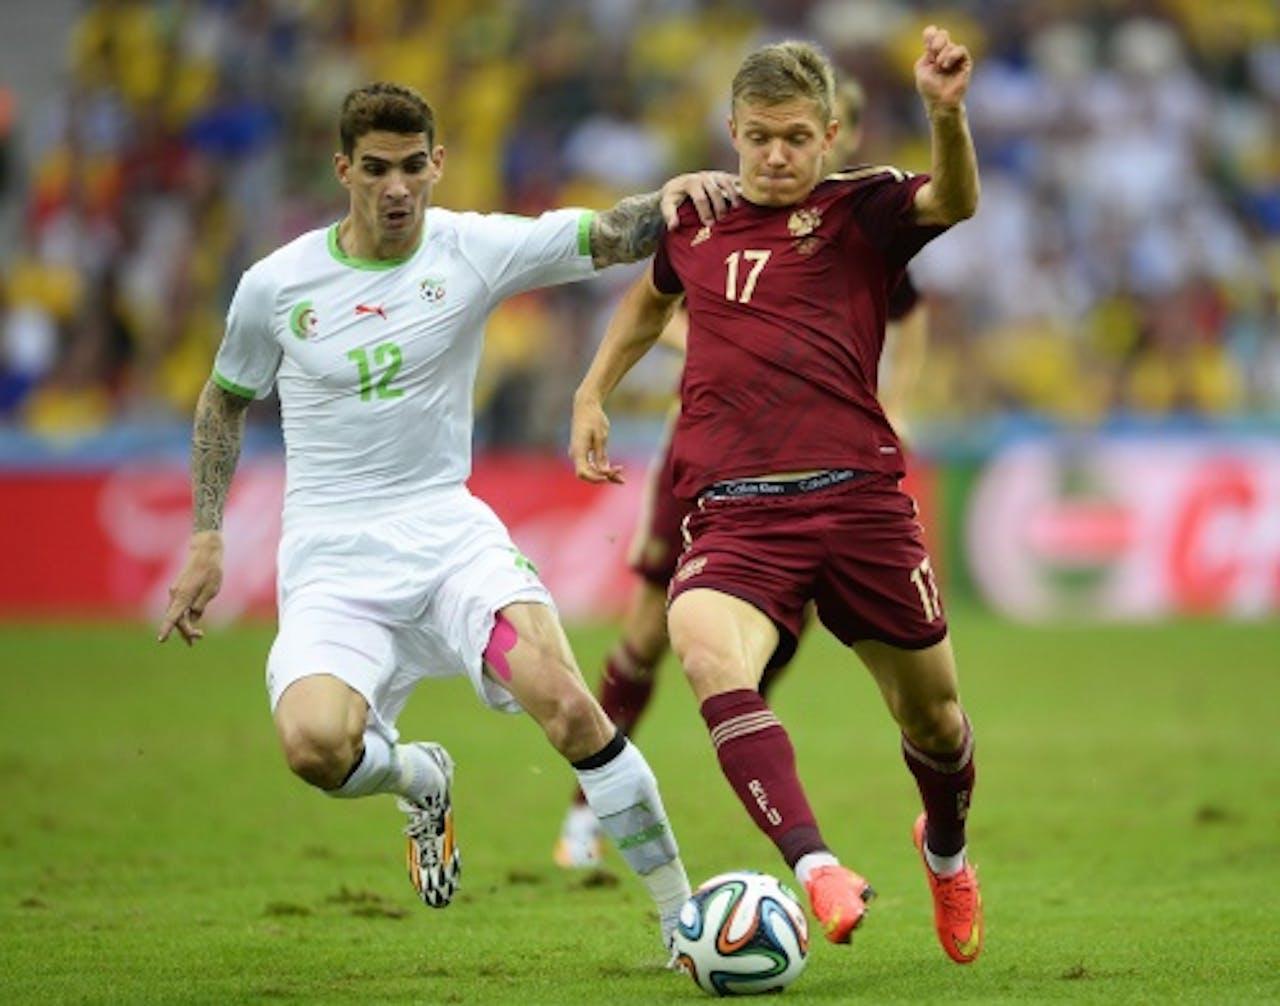 Oleg Shatov (R) van Rusland in duel met Carl Medjani (L) van Algerije. EPA